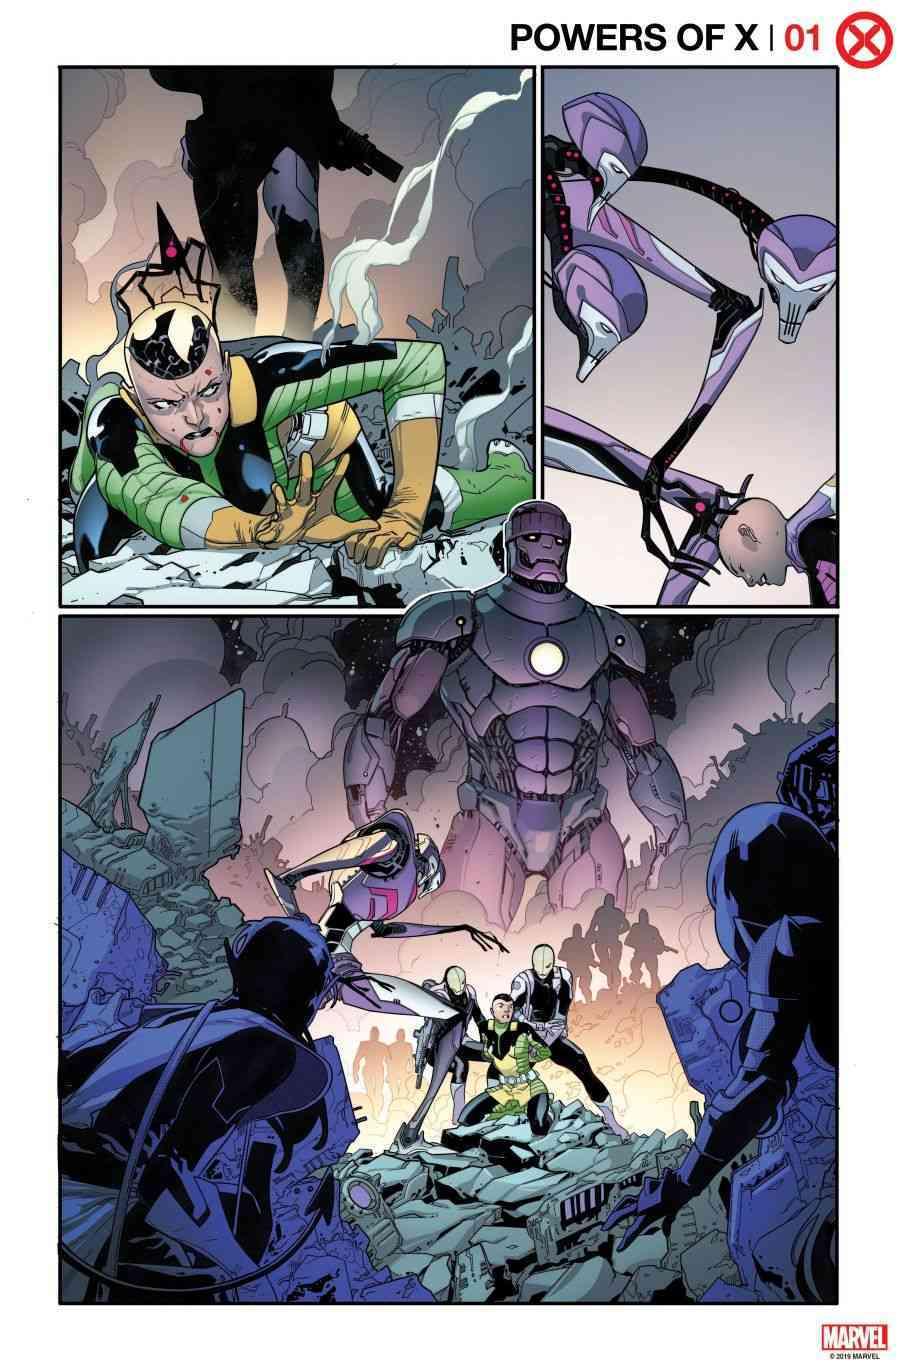 Os X-Men de Jonathan Hickman - Powers of X #1 - Arte interna 1 - Blog Farofeiros